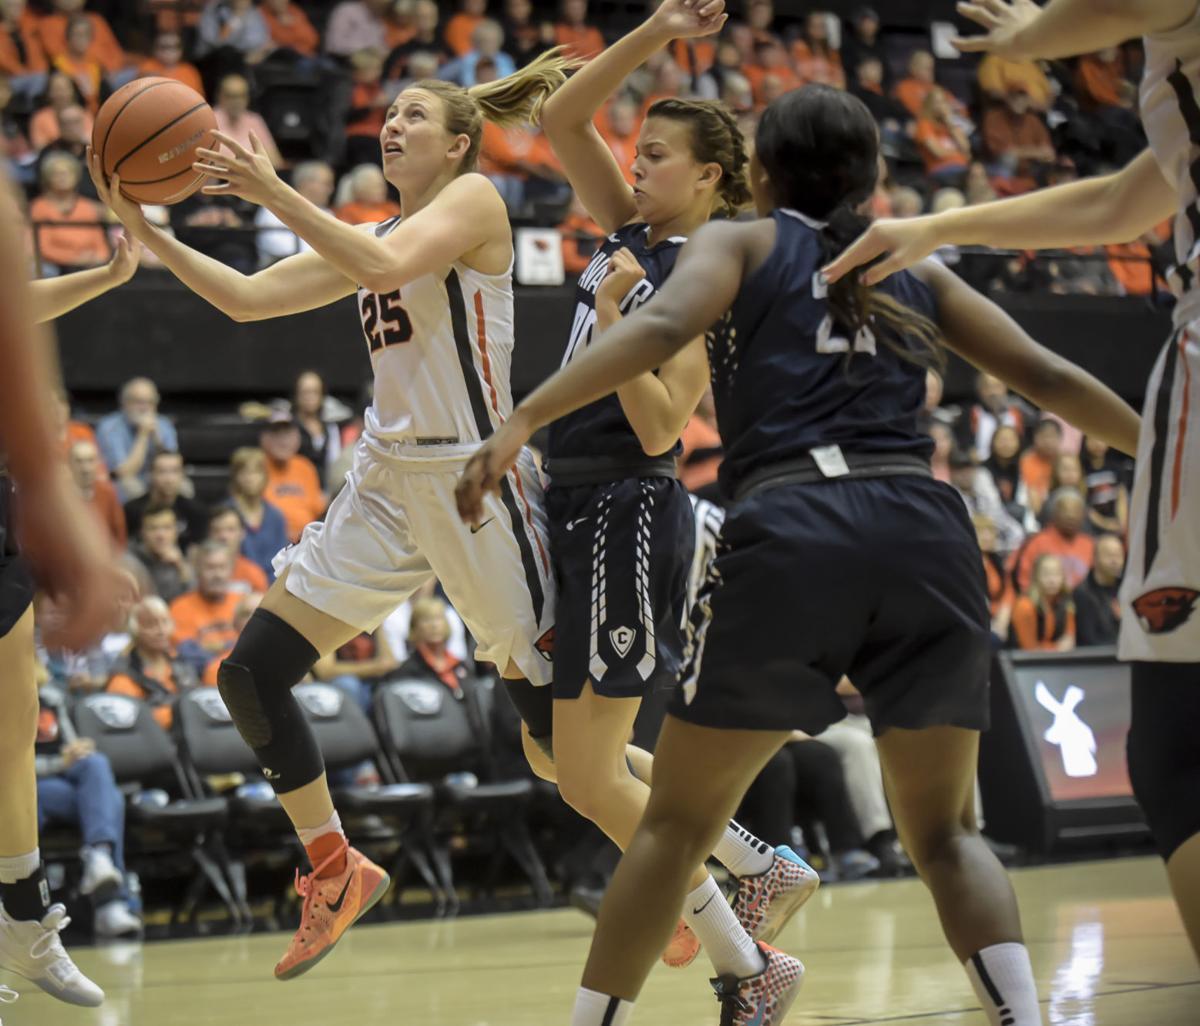 Gallery: OSU vs Concordia basketball 04